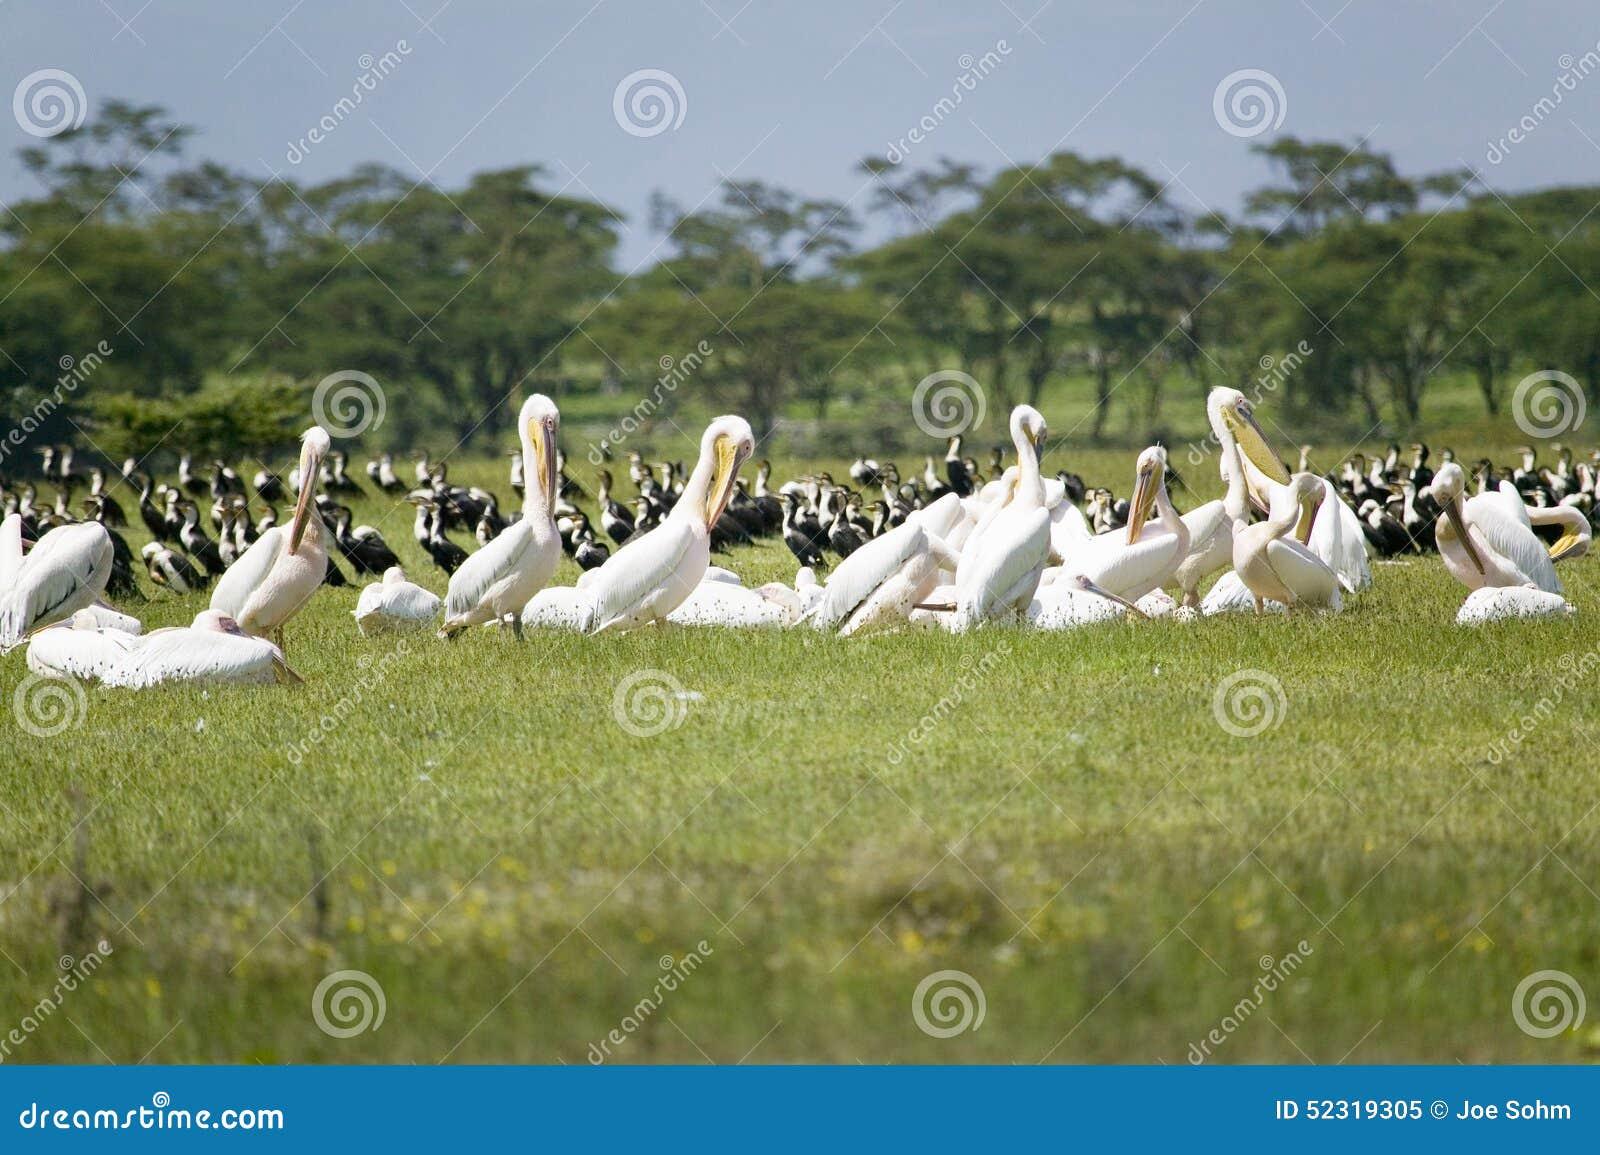 White Pelicans at Lake Naivasha, Great Rift Valley, Kenya, Africa